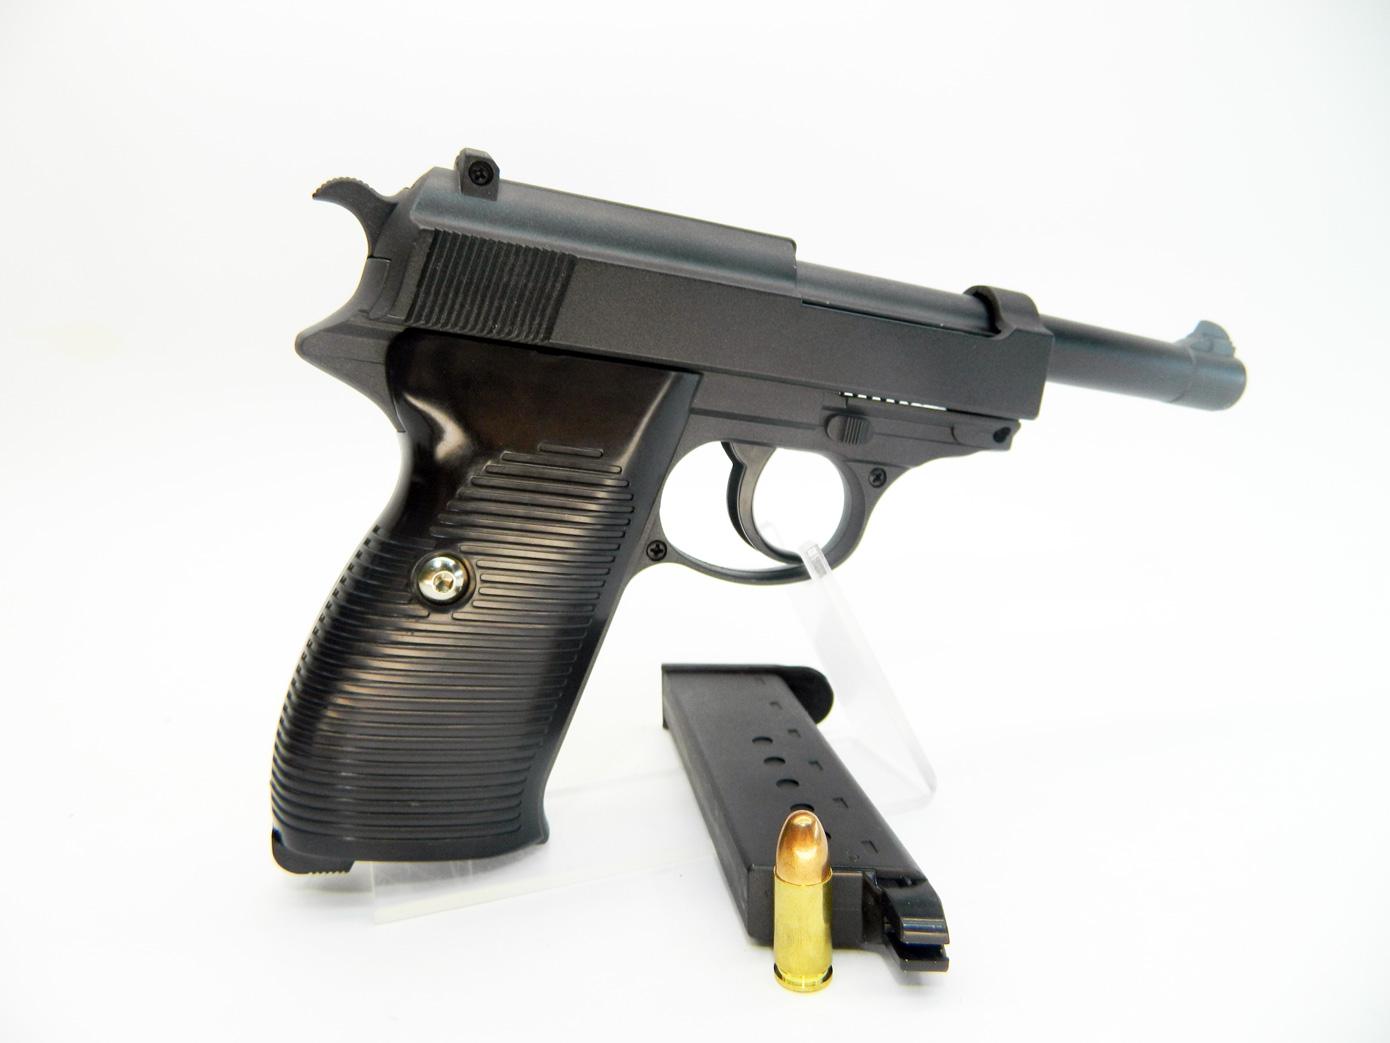 Walther P38 масштаб 1:1 изображение 1